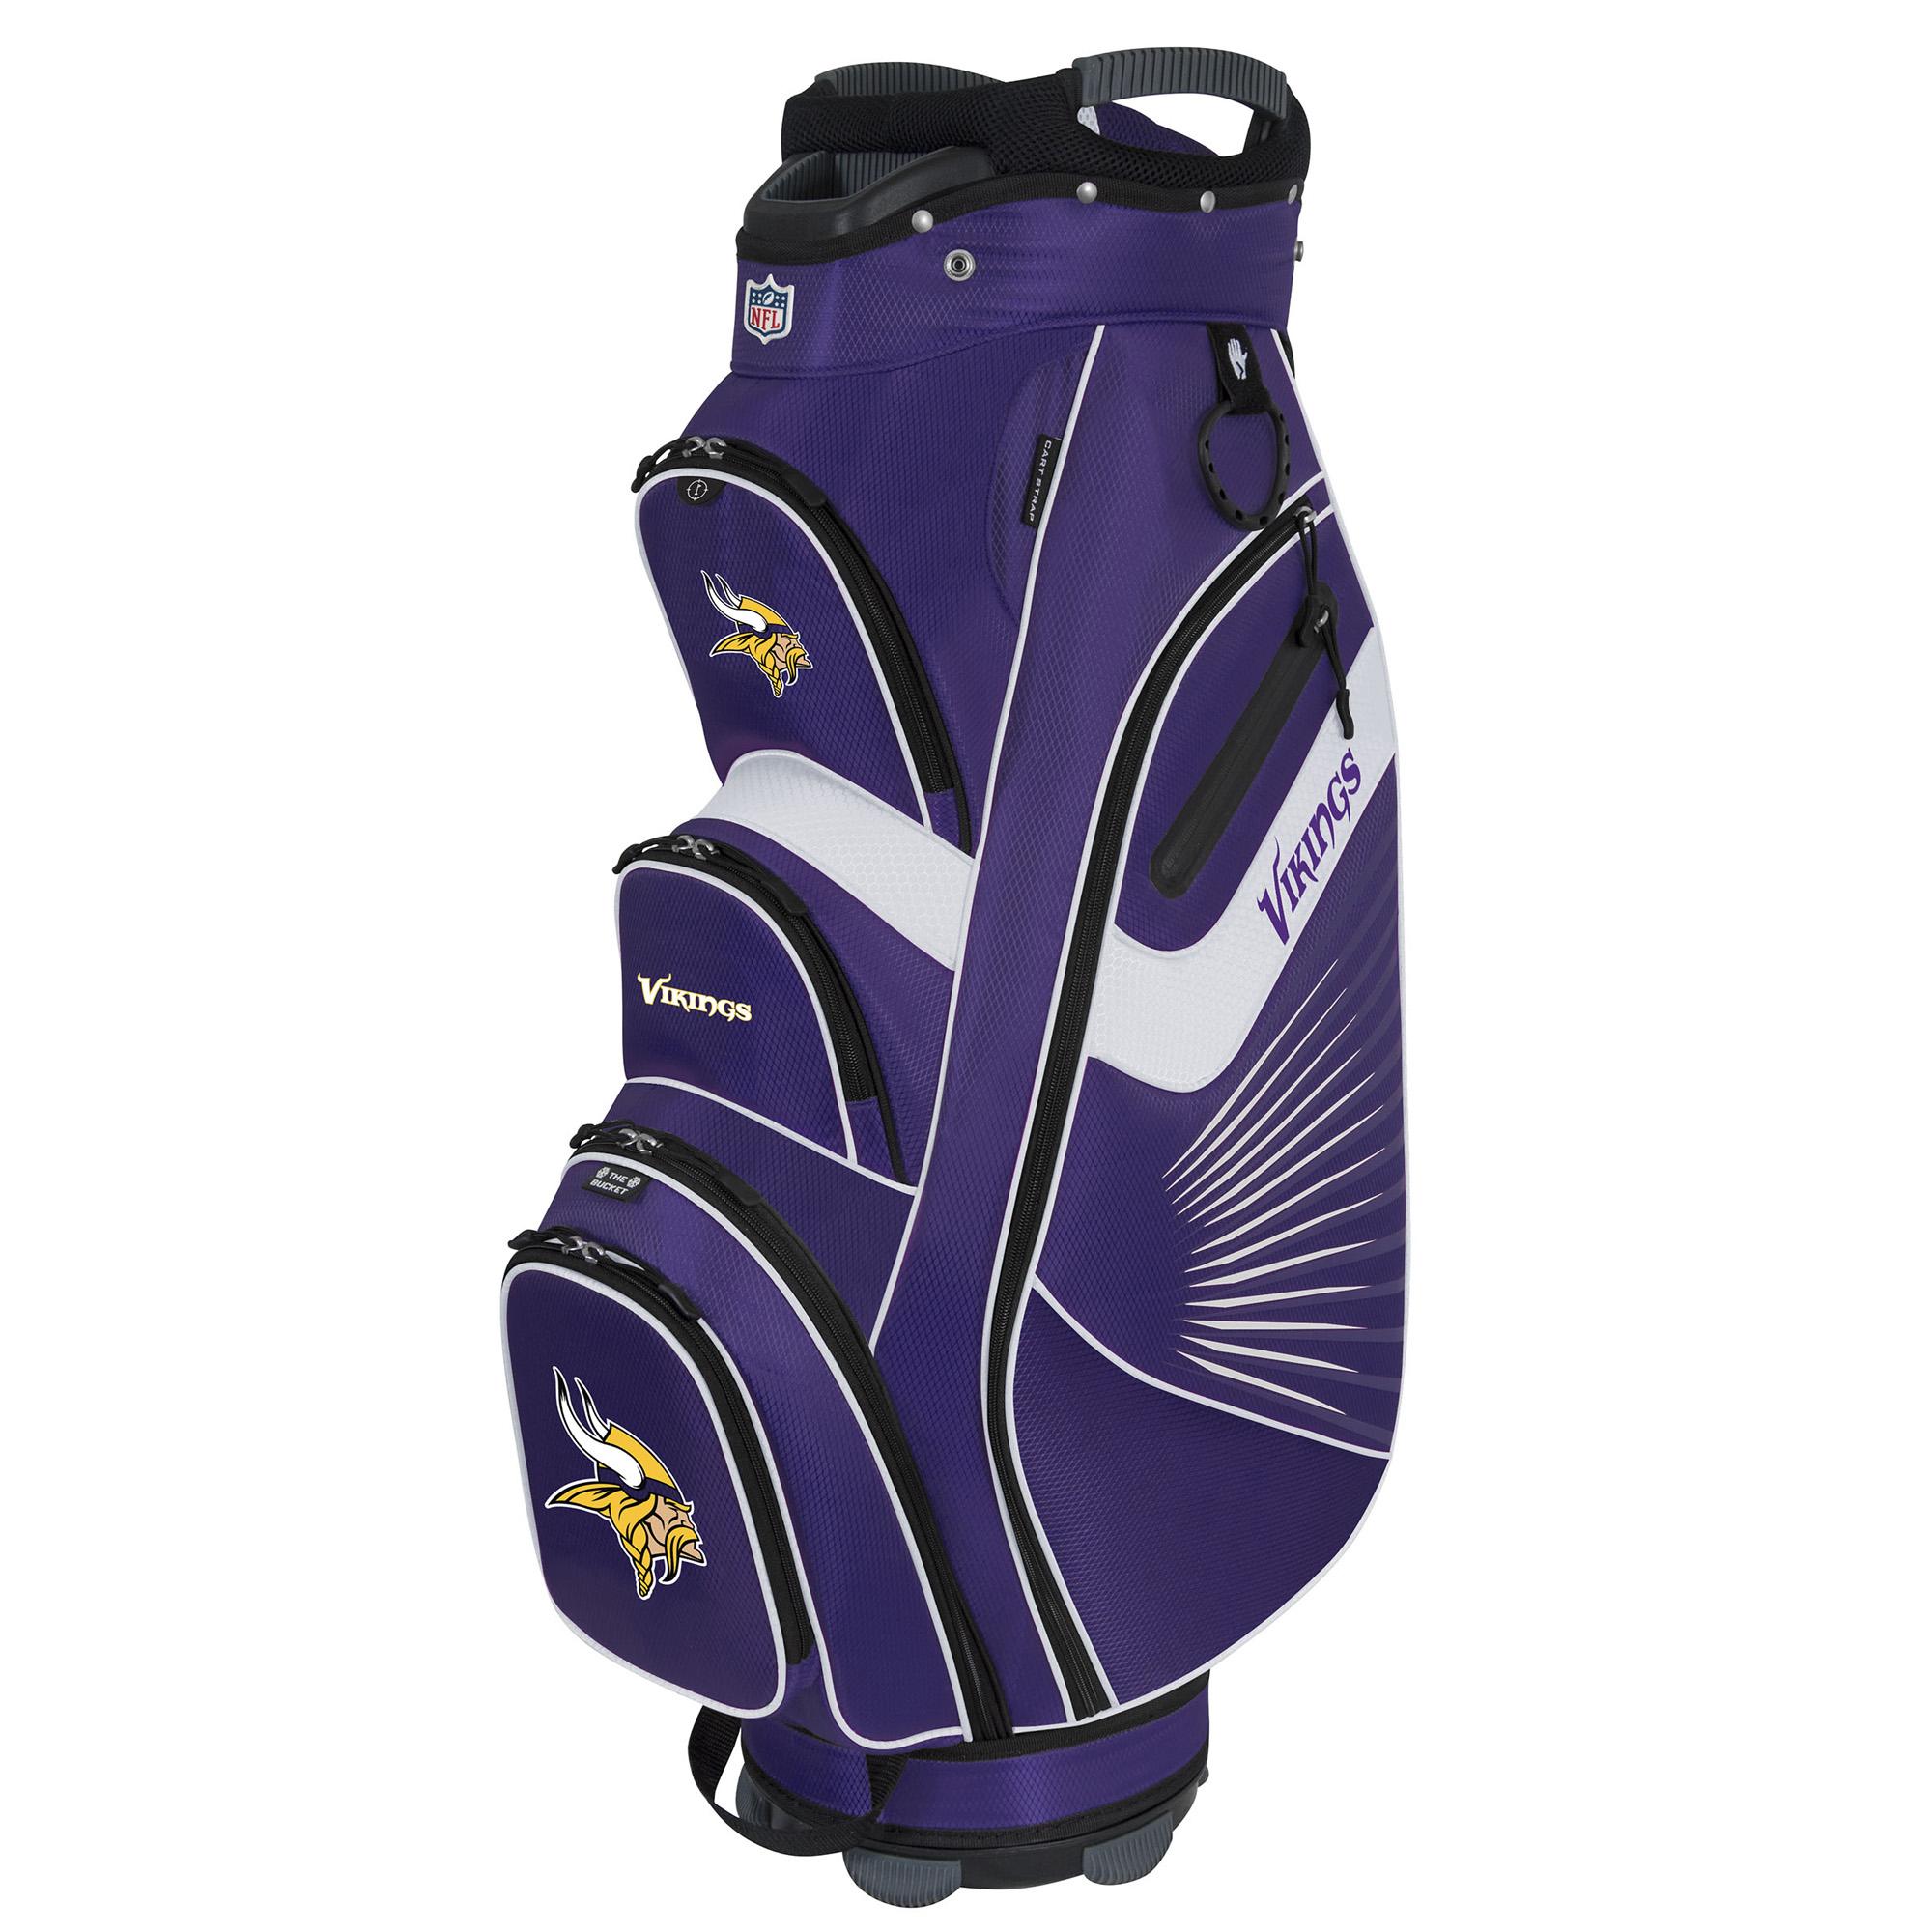 Minnesota Vikings The Bucket II Cooler Cart Bag - No Size